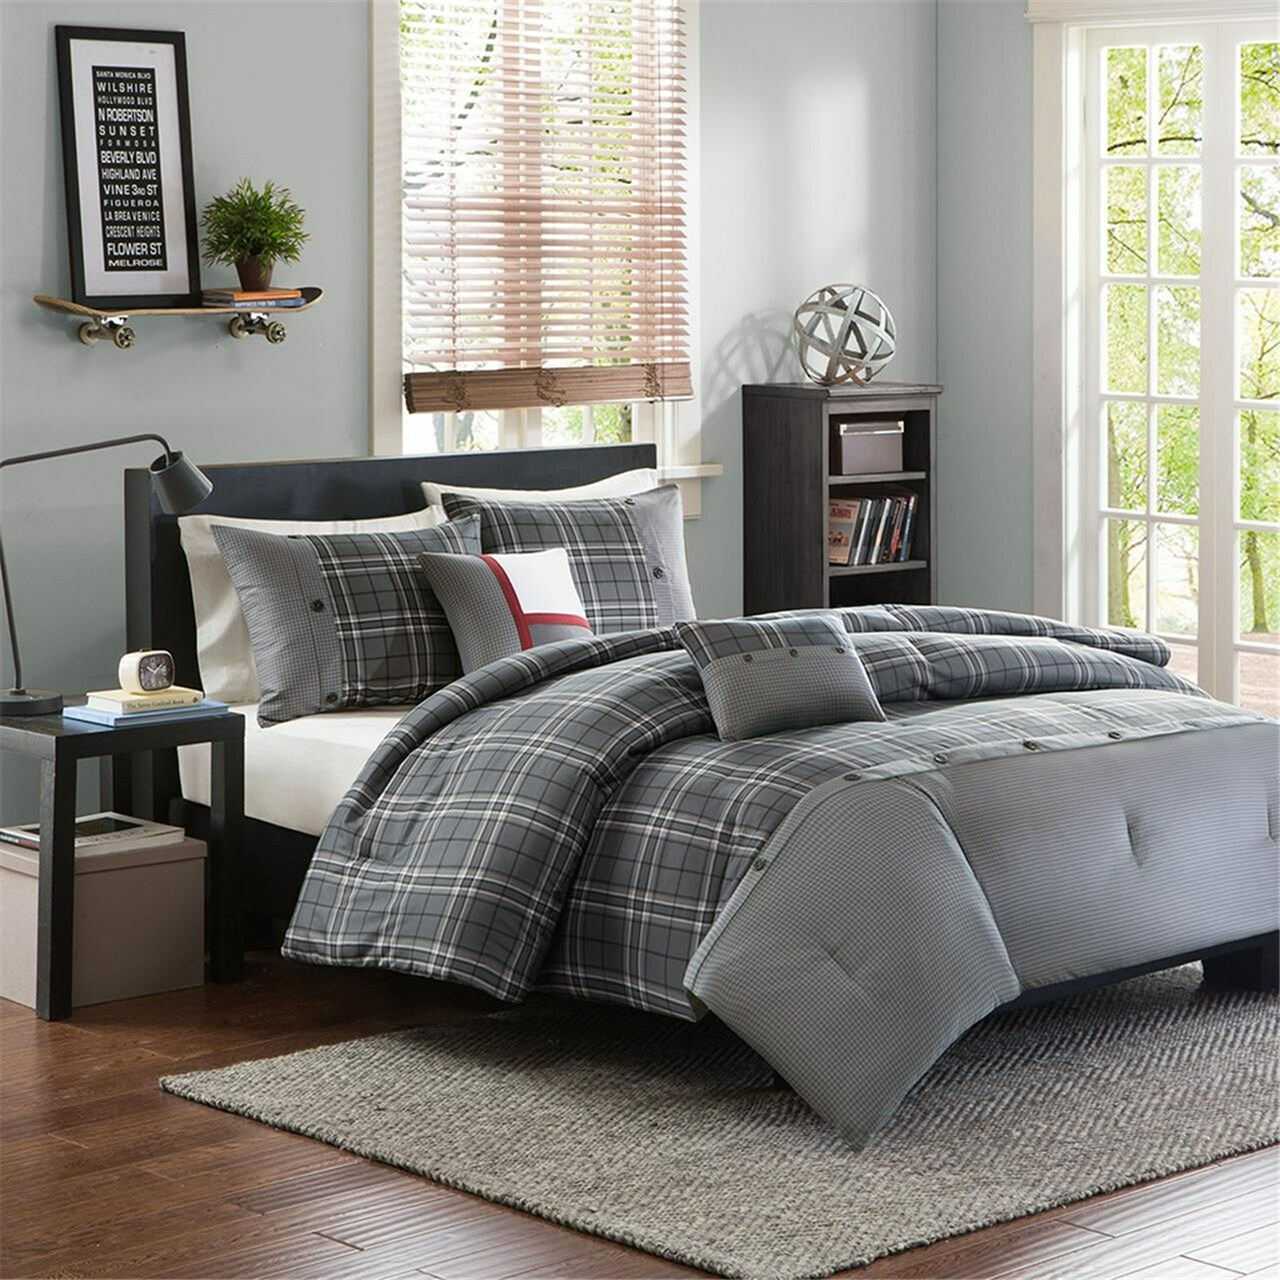 Ens Douillette Comforter Set Daryl Queen 5 Mcx Pcs Giftopolis